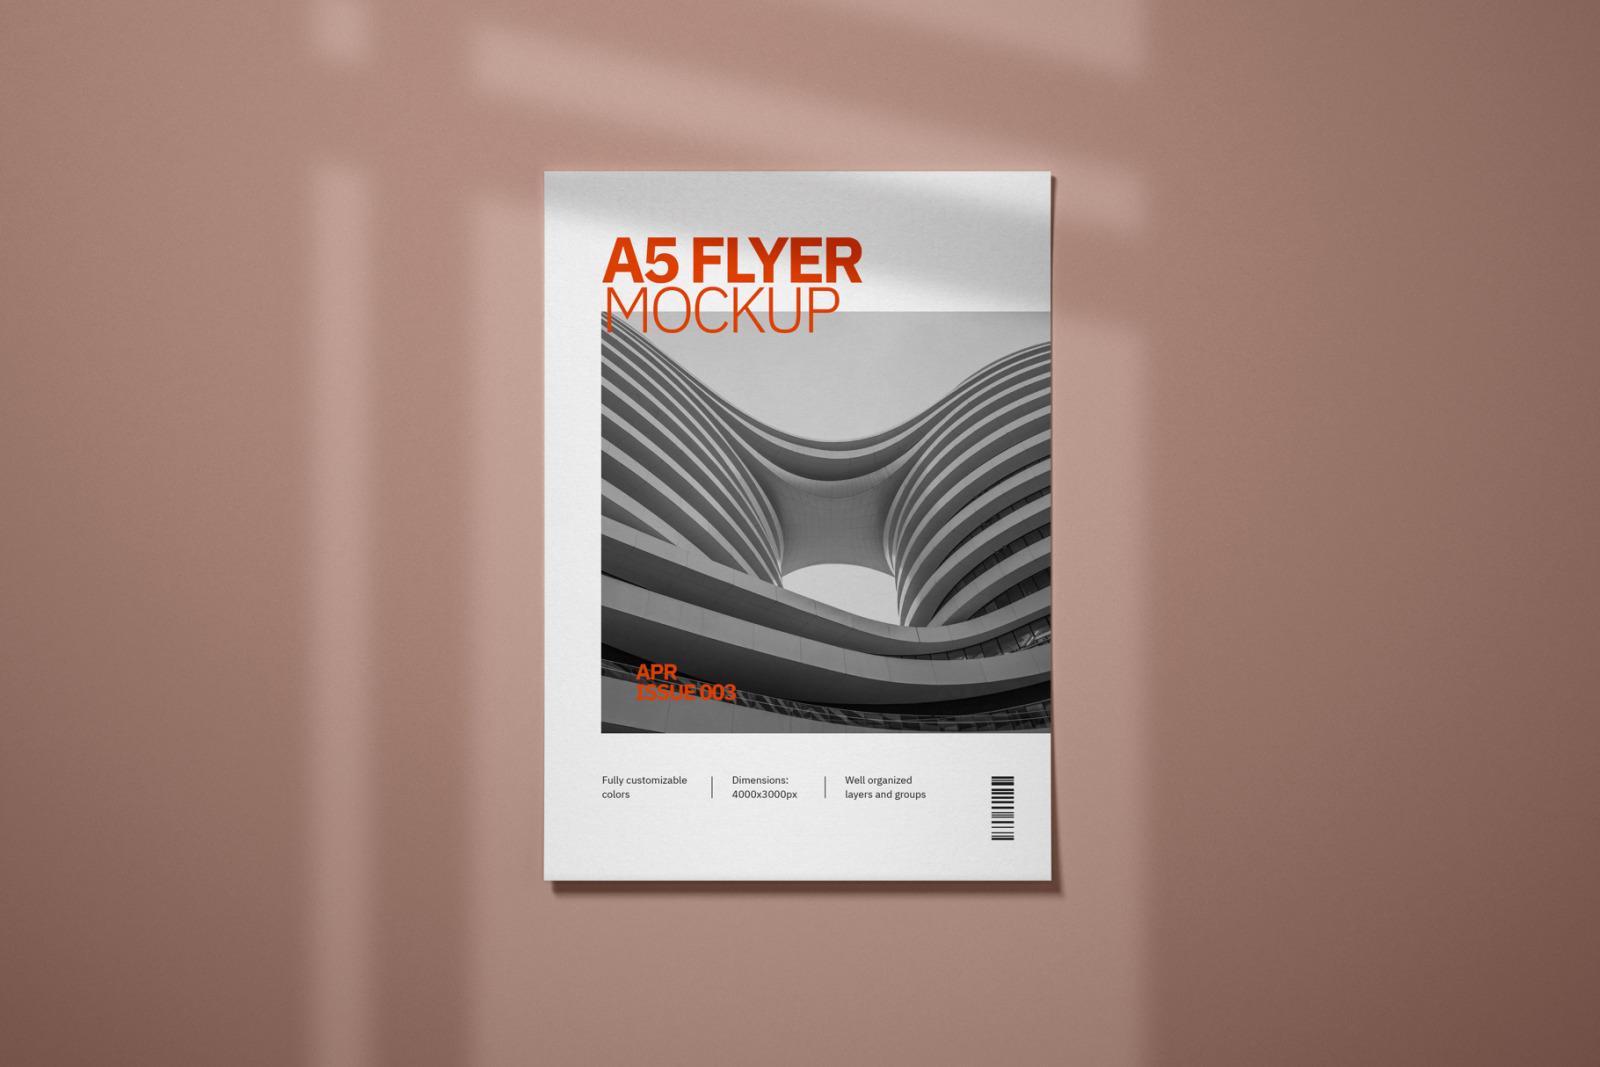 A5 Flyer Mockup Set